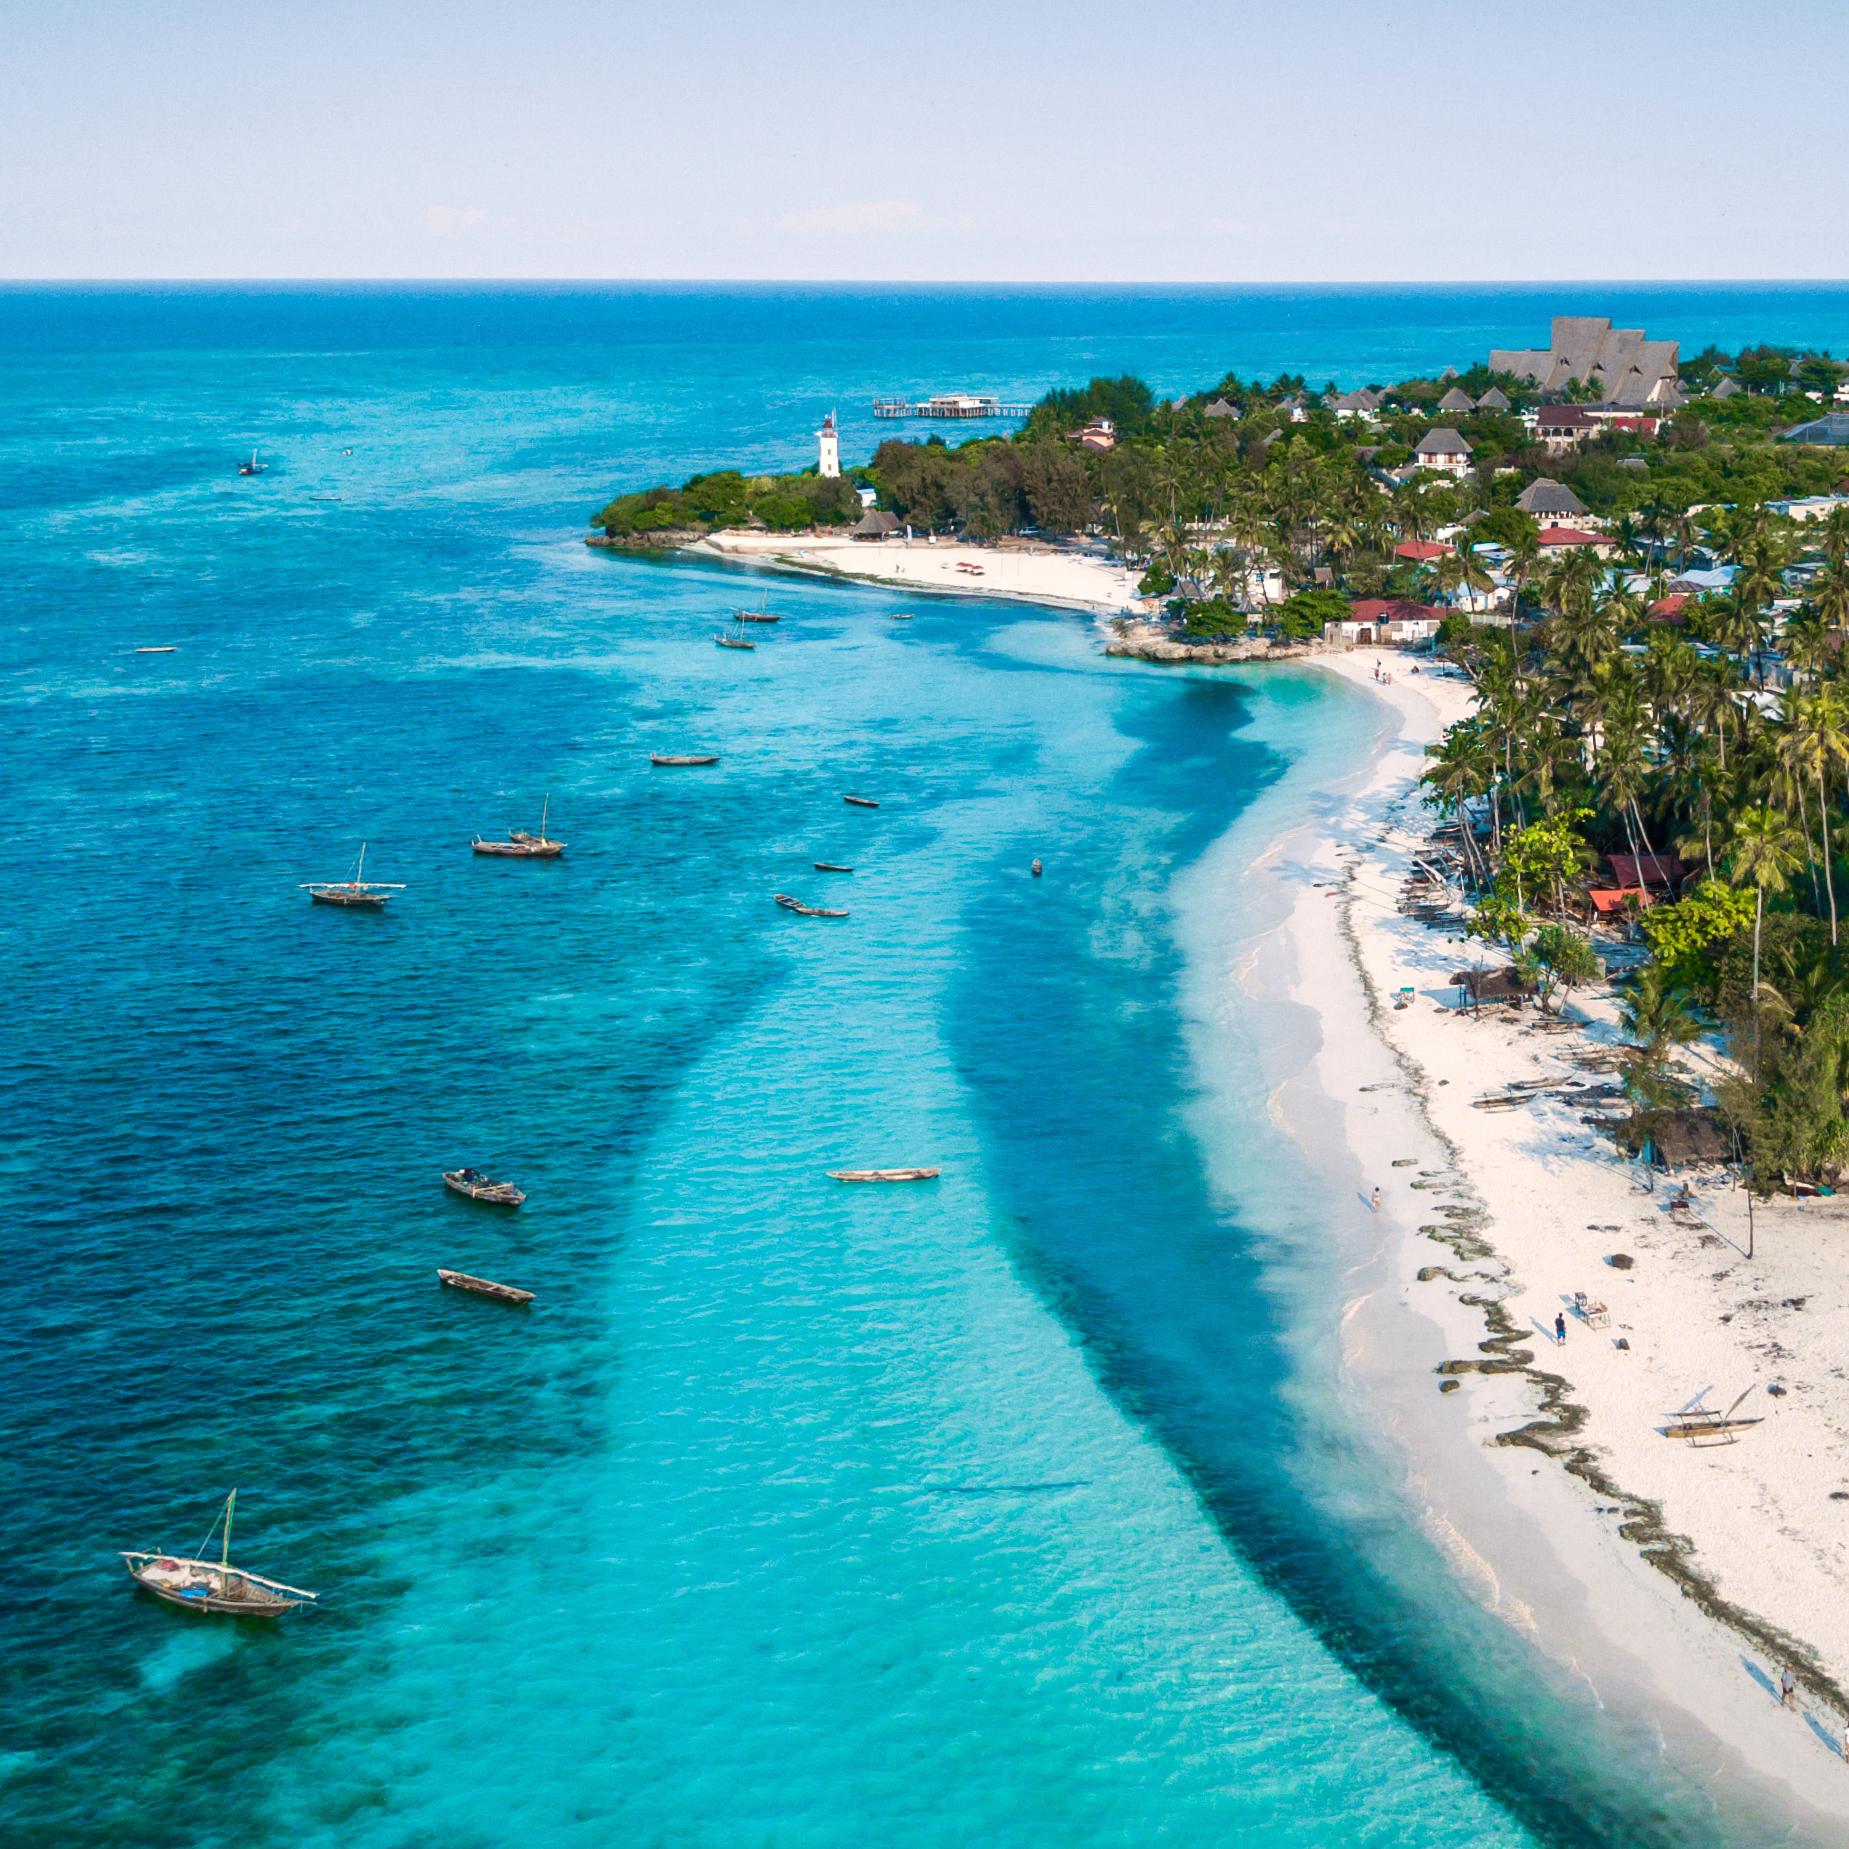 Beach views in Zanzibar.